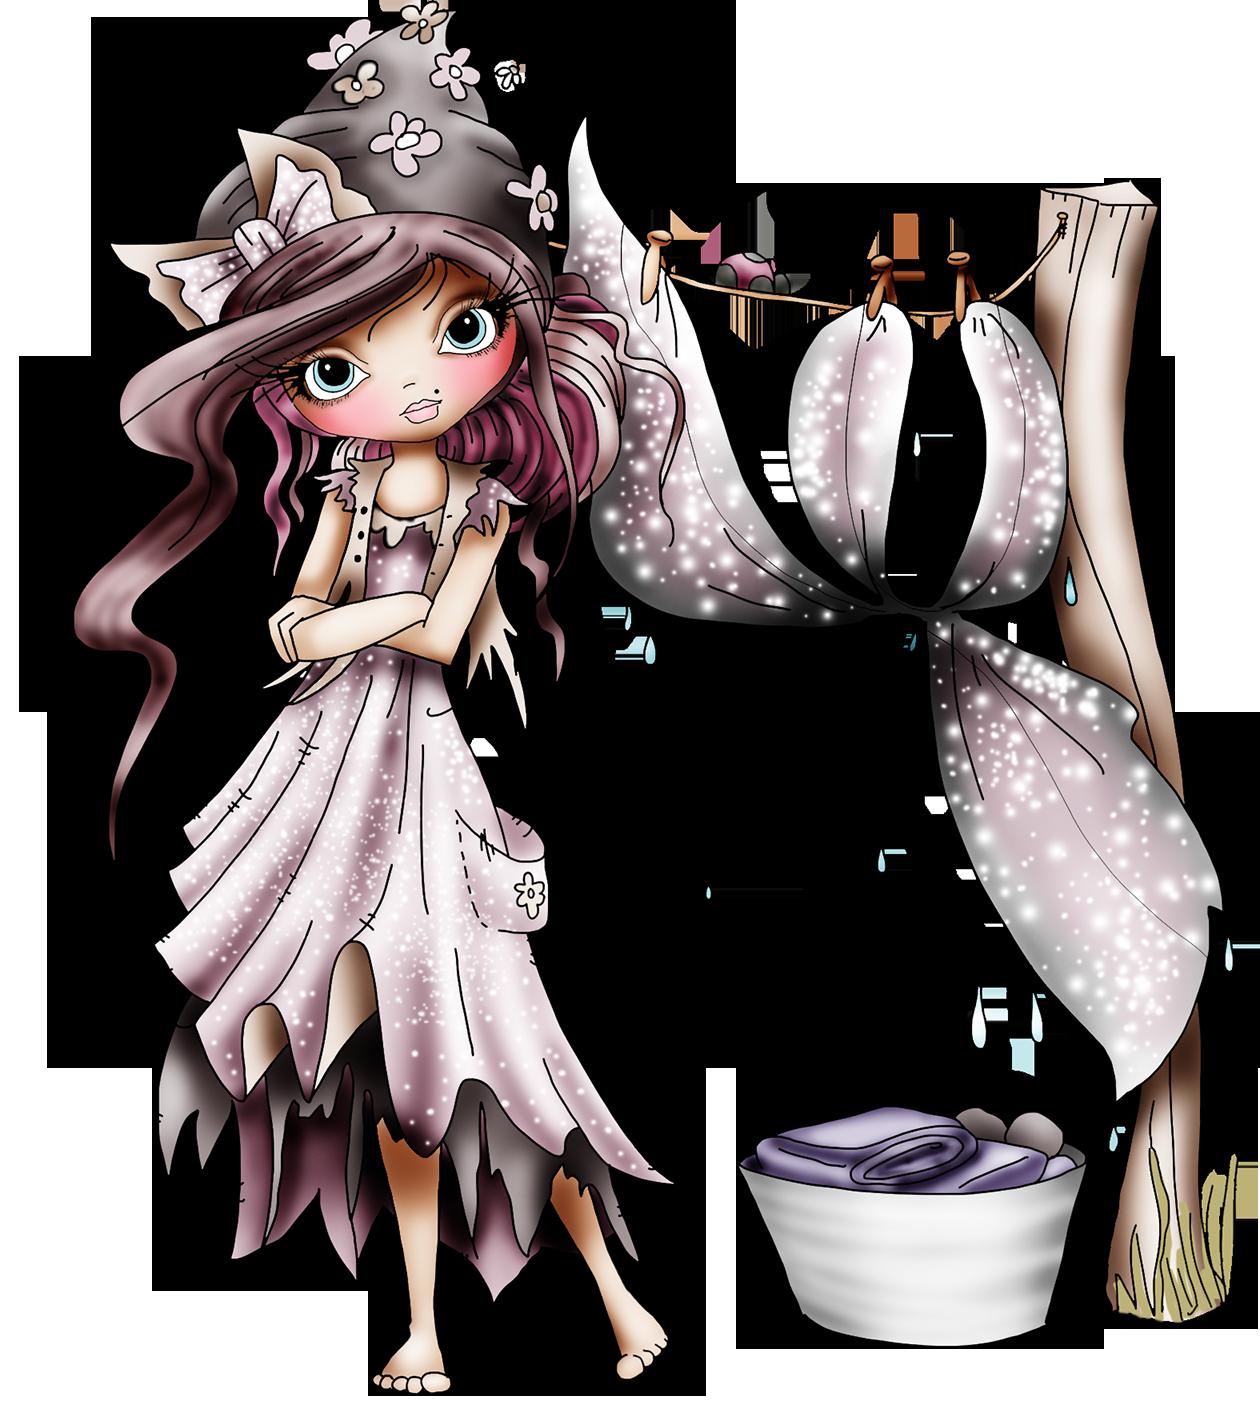 Octavia_Washing_Dayc.png